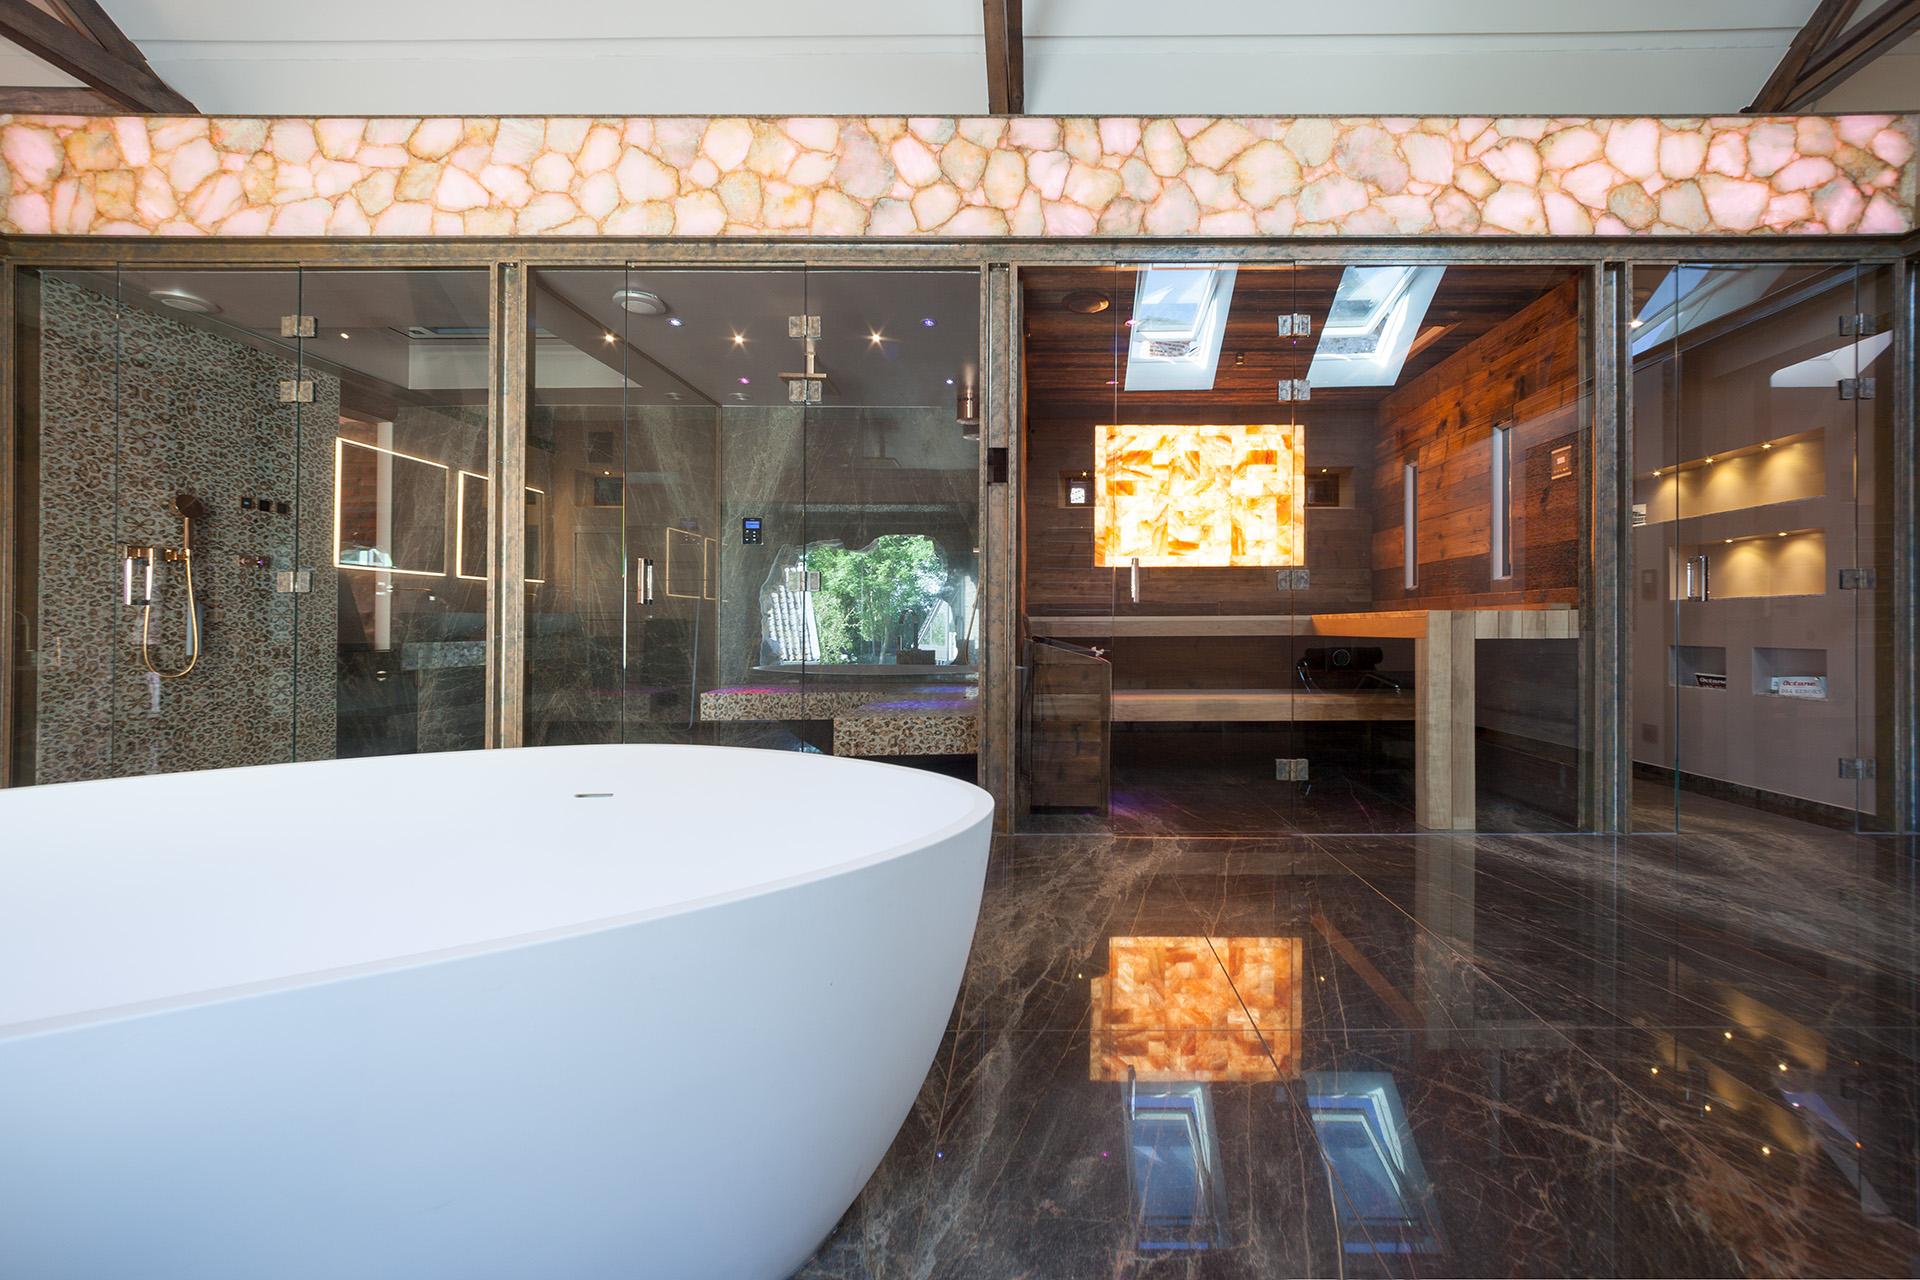 precious_stone_lumen_quarz_antolini_collection_marmor_radermacher_exklusive_badgestaltung_modernes_design